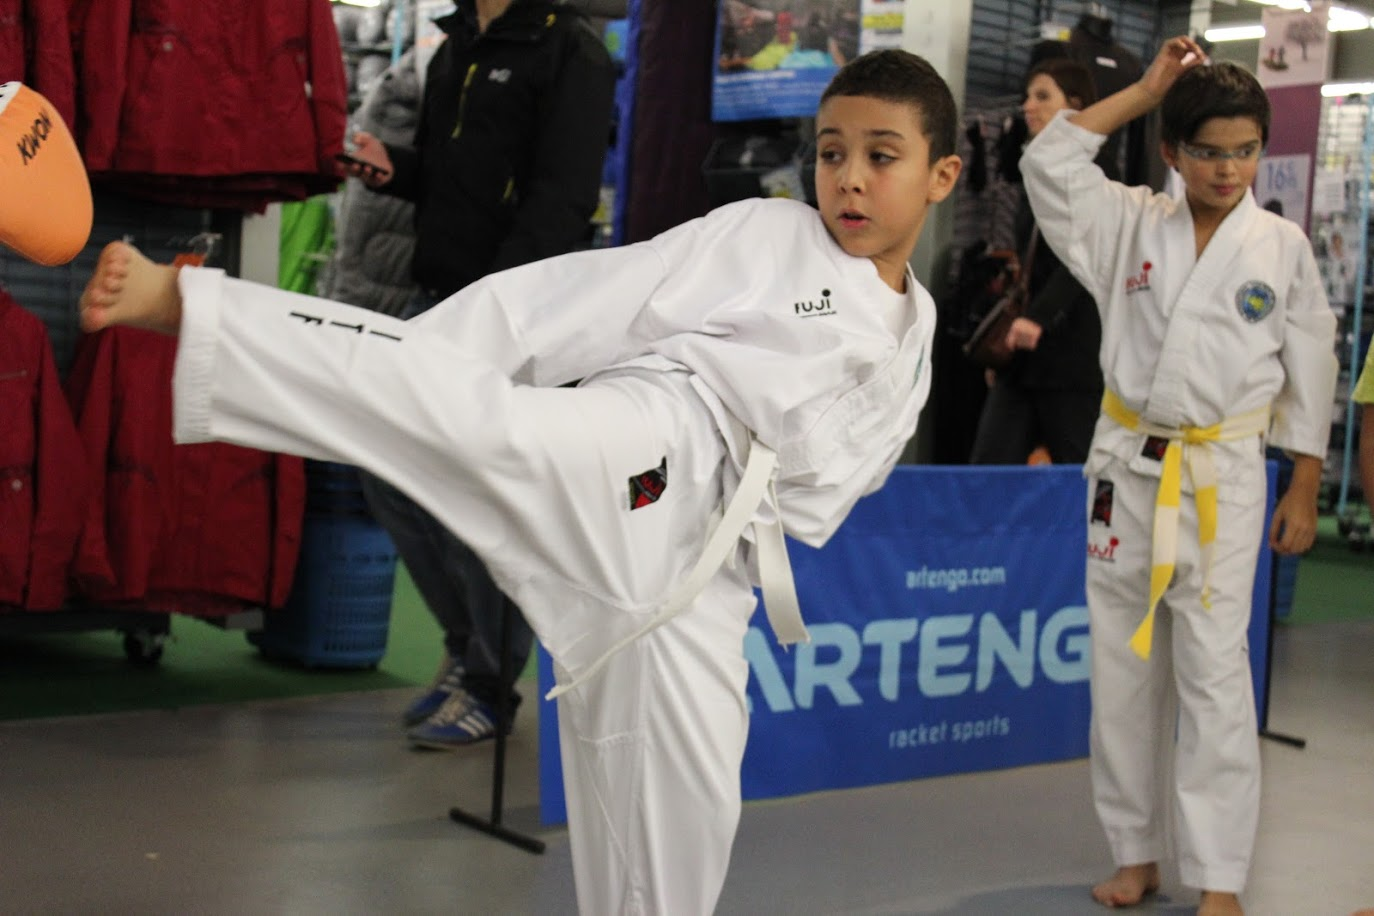 taekwon-do-itf-strasbourg-pratique-enfants